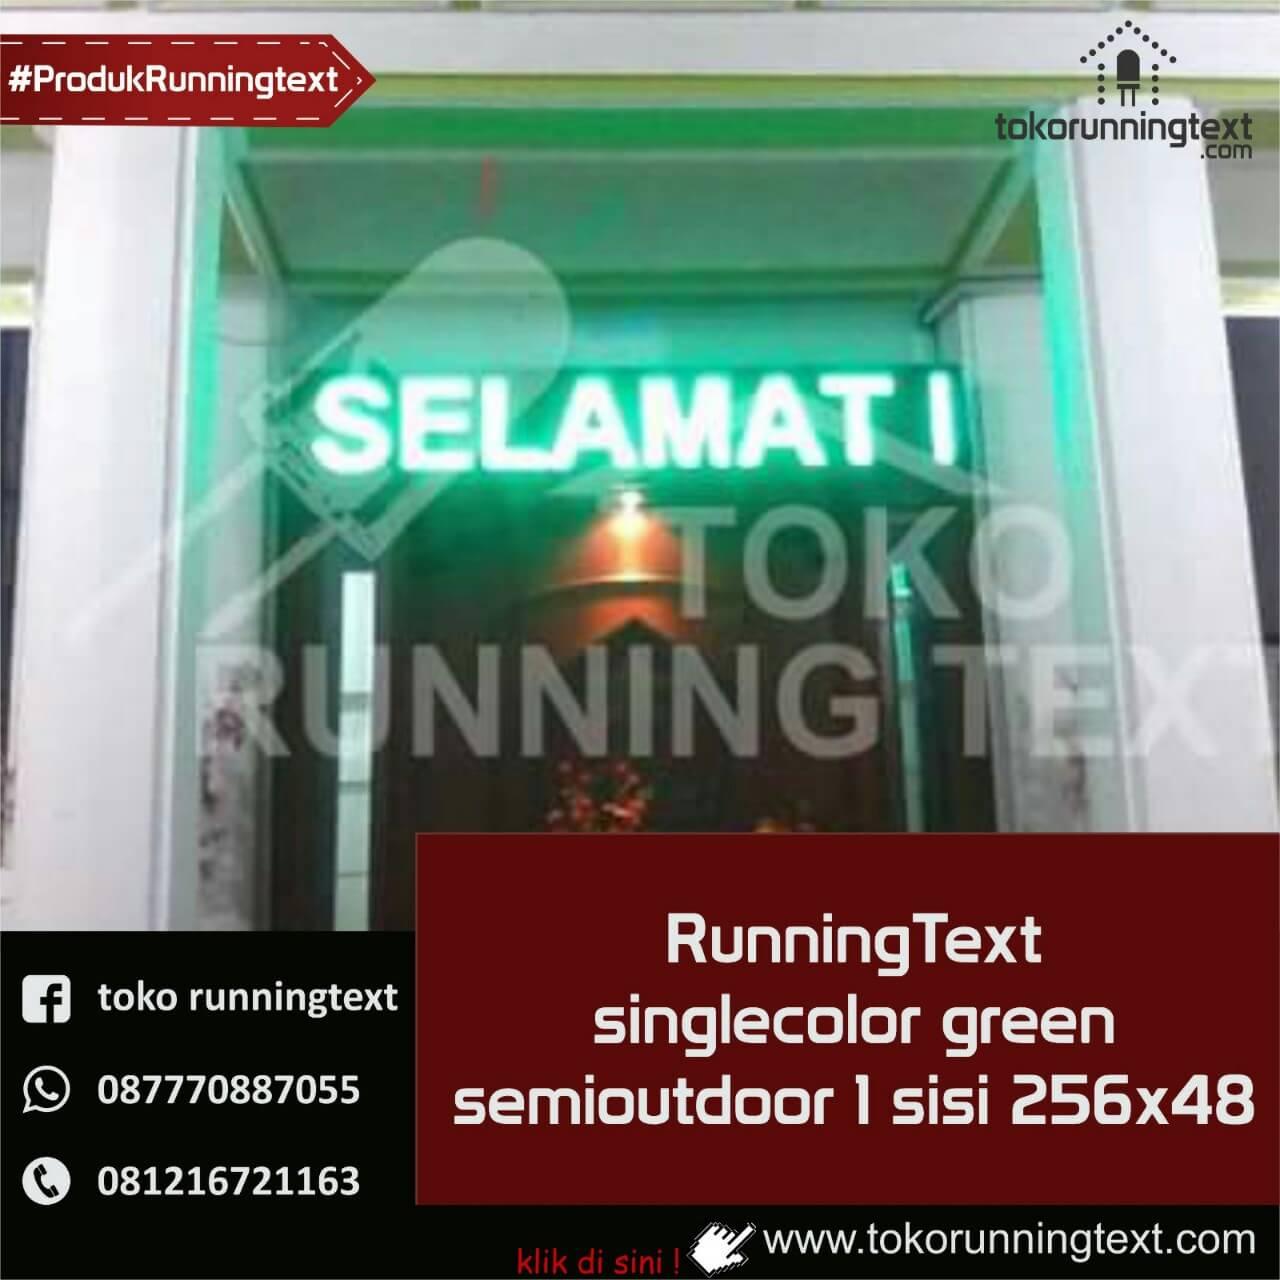 Runningtext singlecolor Green,semioutdoor 1 sisi 256x48